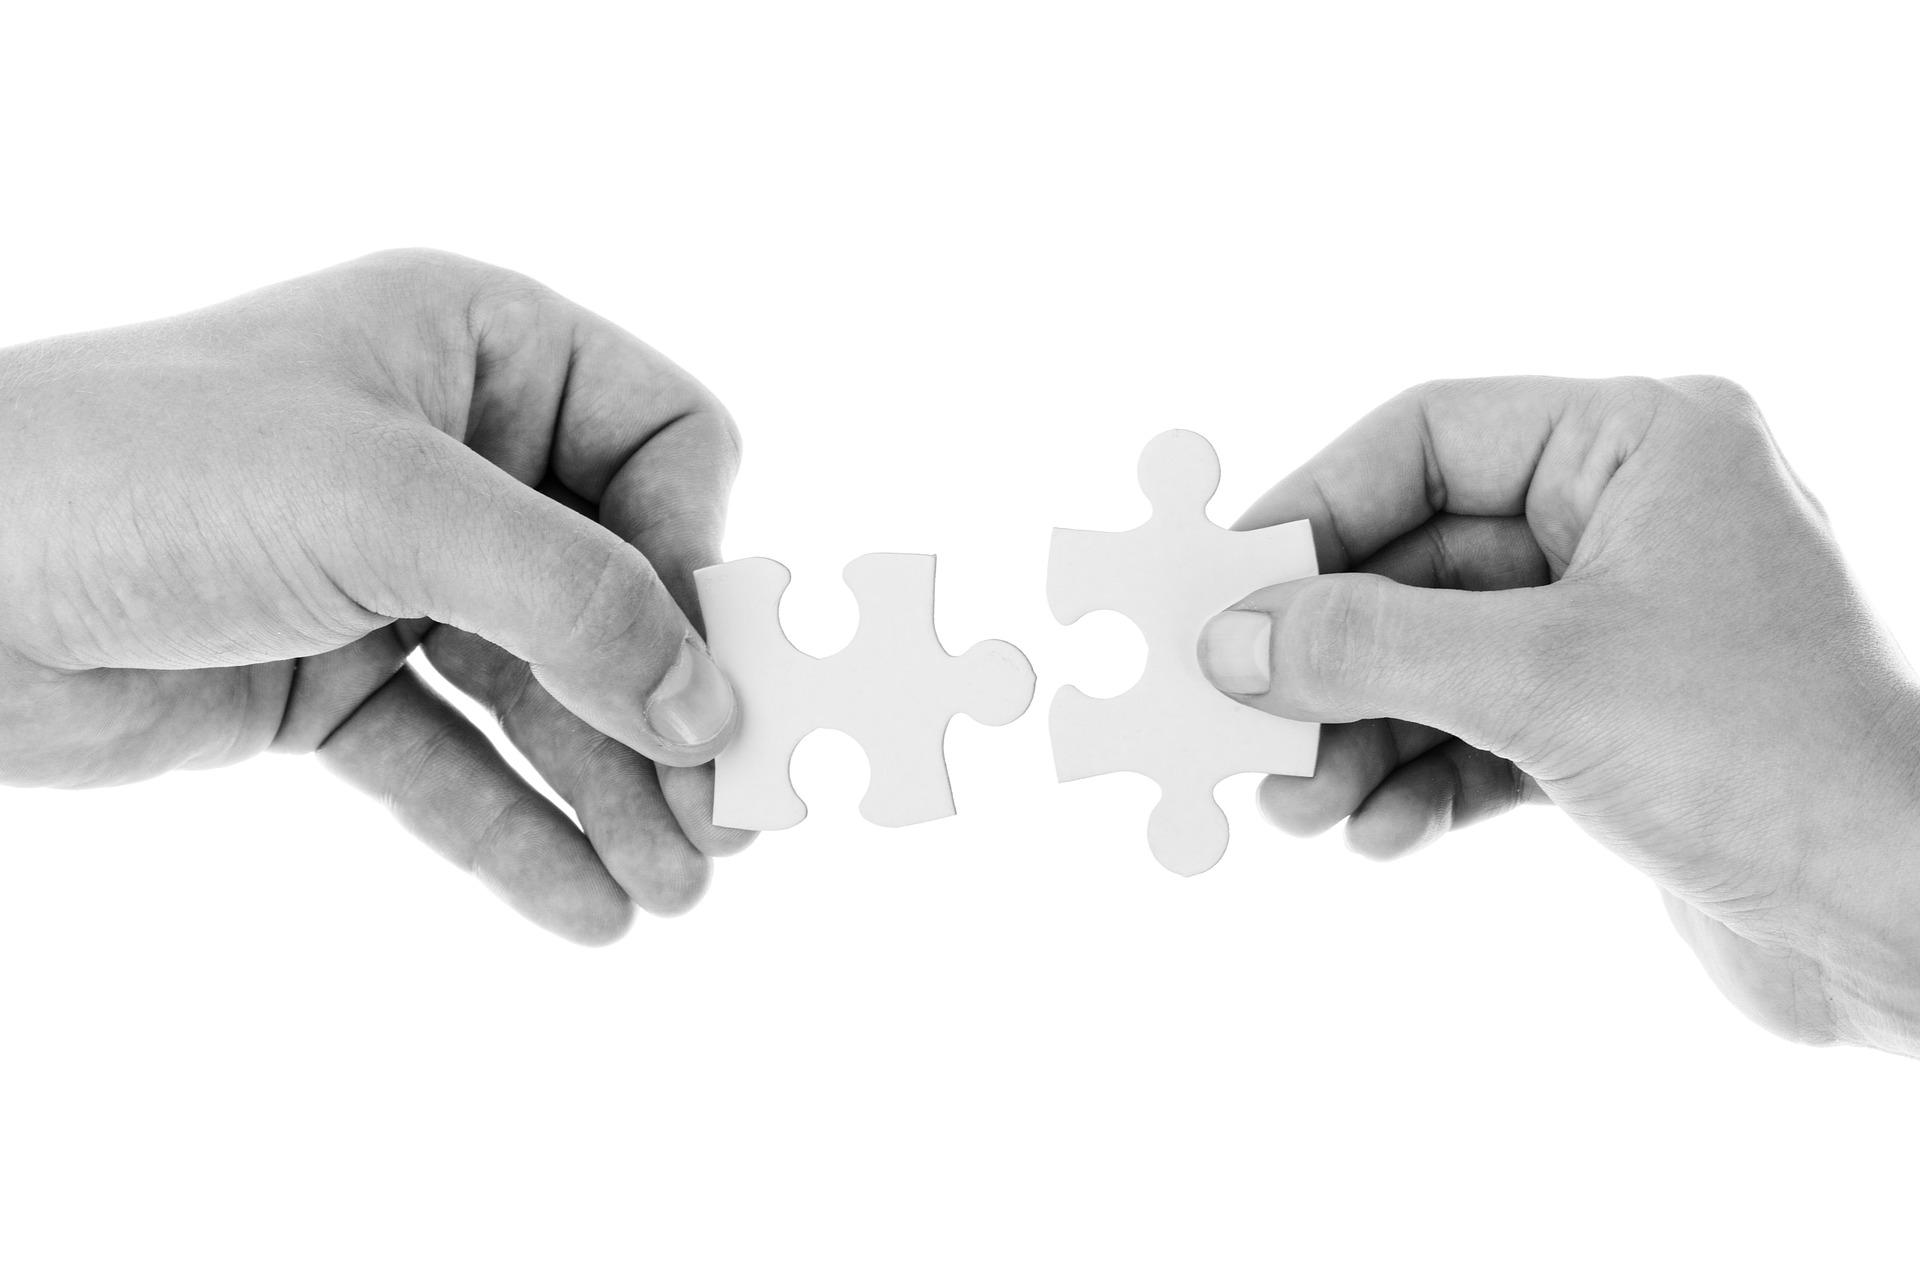 connect 20333 1920 - WordPressの有料テーマを使うメリットと初心者におすすめ15選を紹介